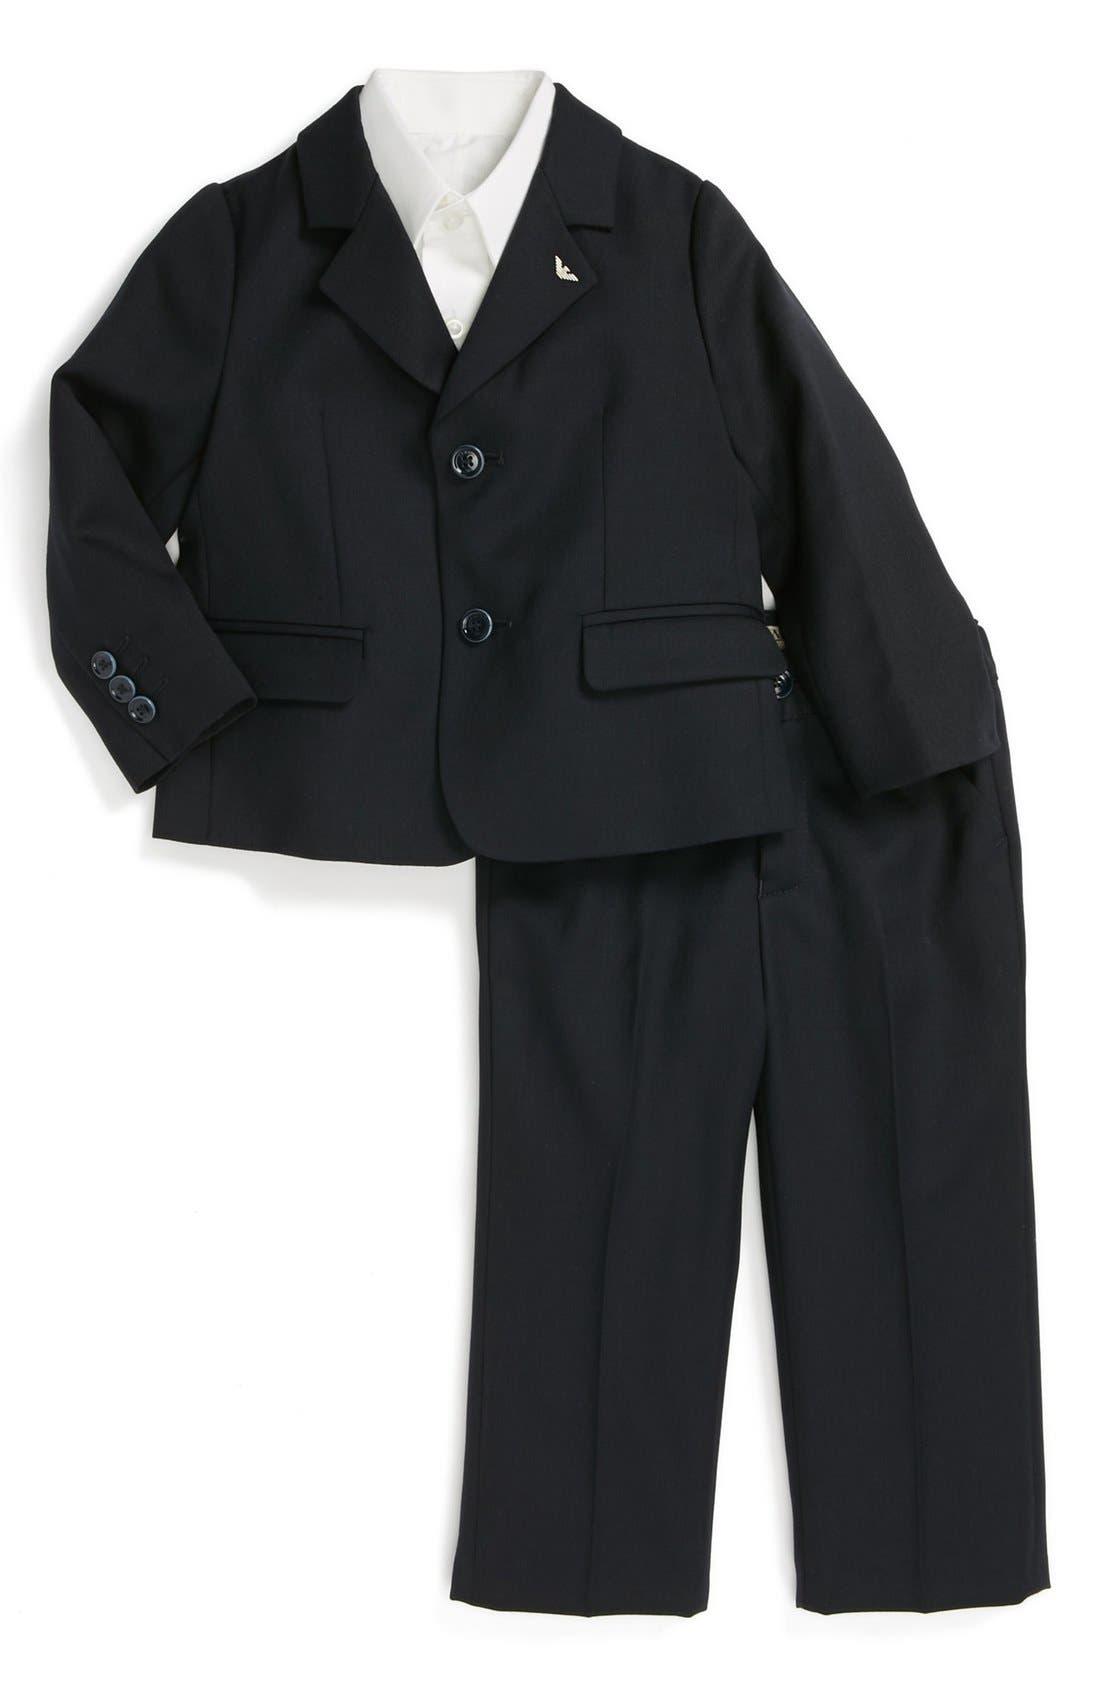 Alternate Image 1 Selected - Armani Junior Wool Suit (Baby Boys)